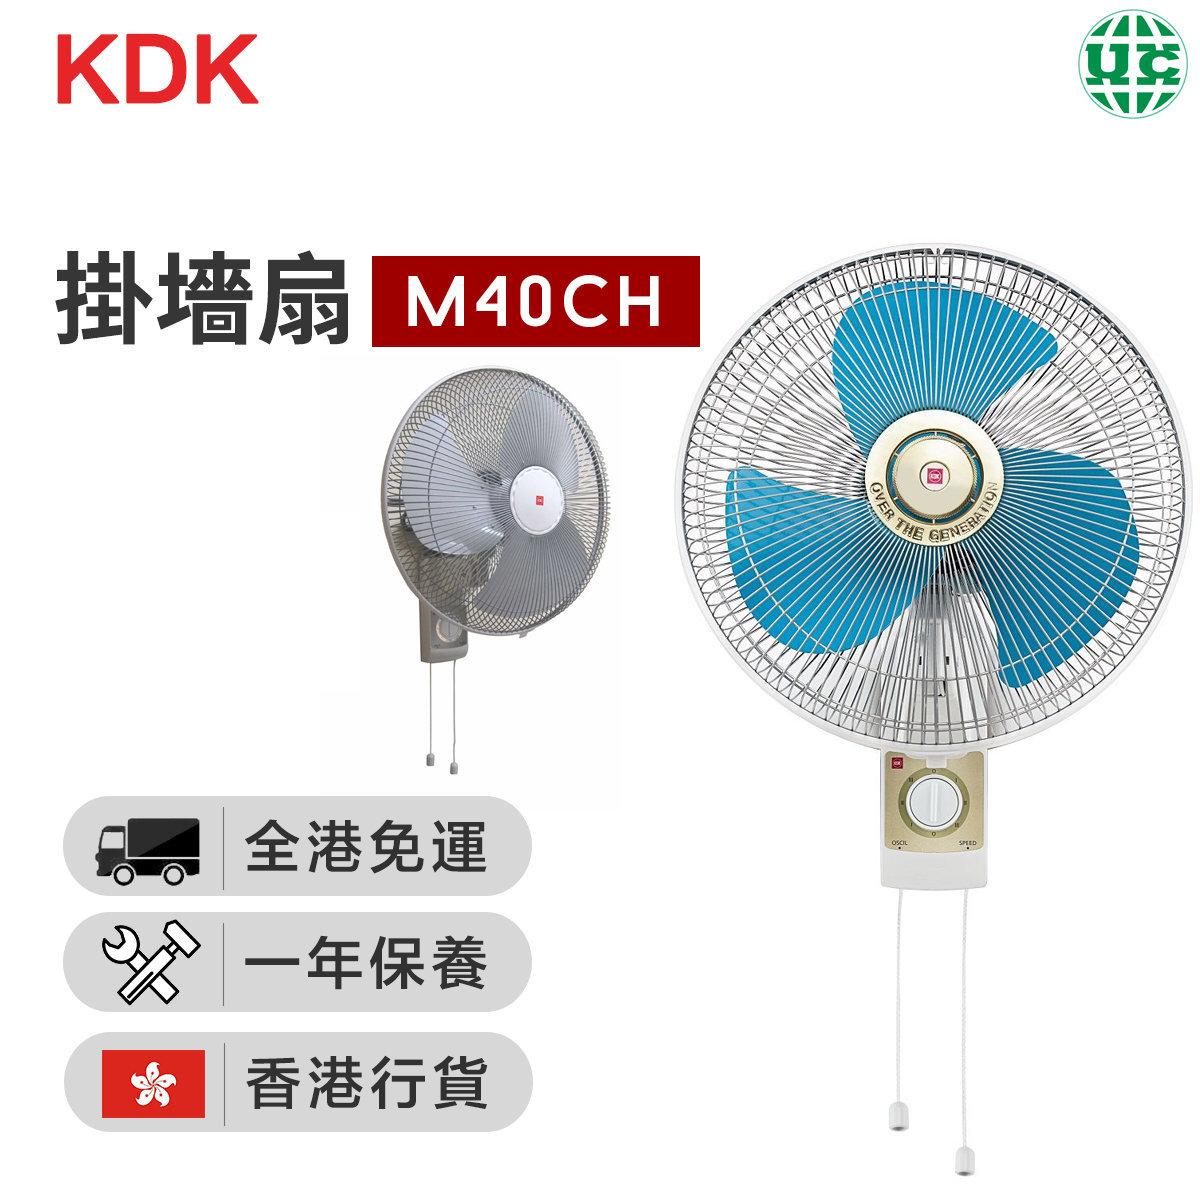 KDK - M40CH hanging wall fan(blue)(Hong Kong licensed)